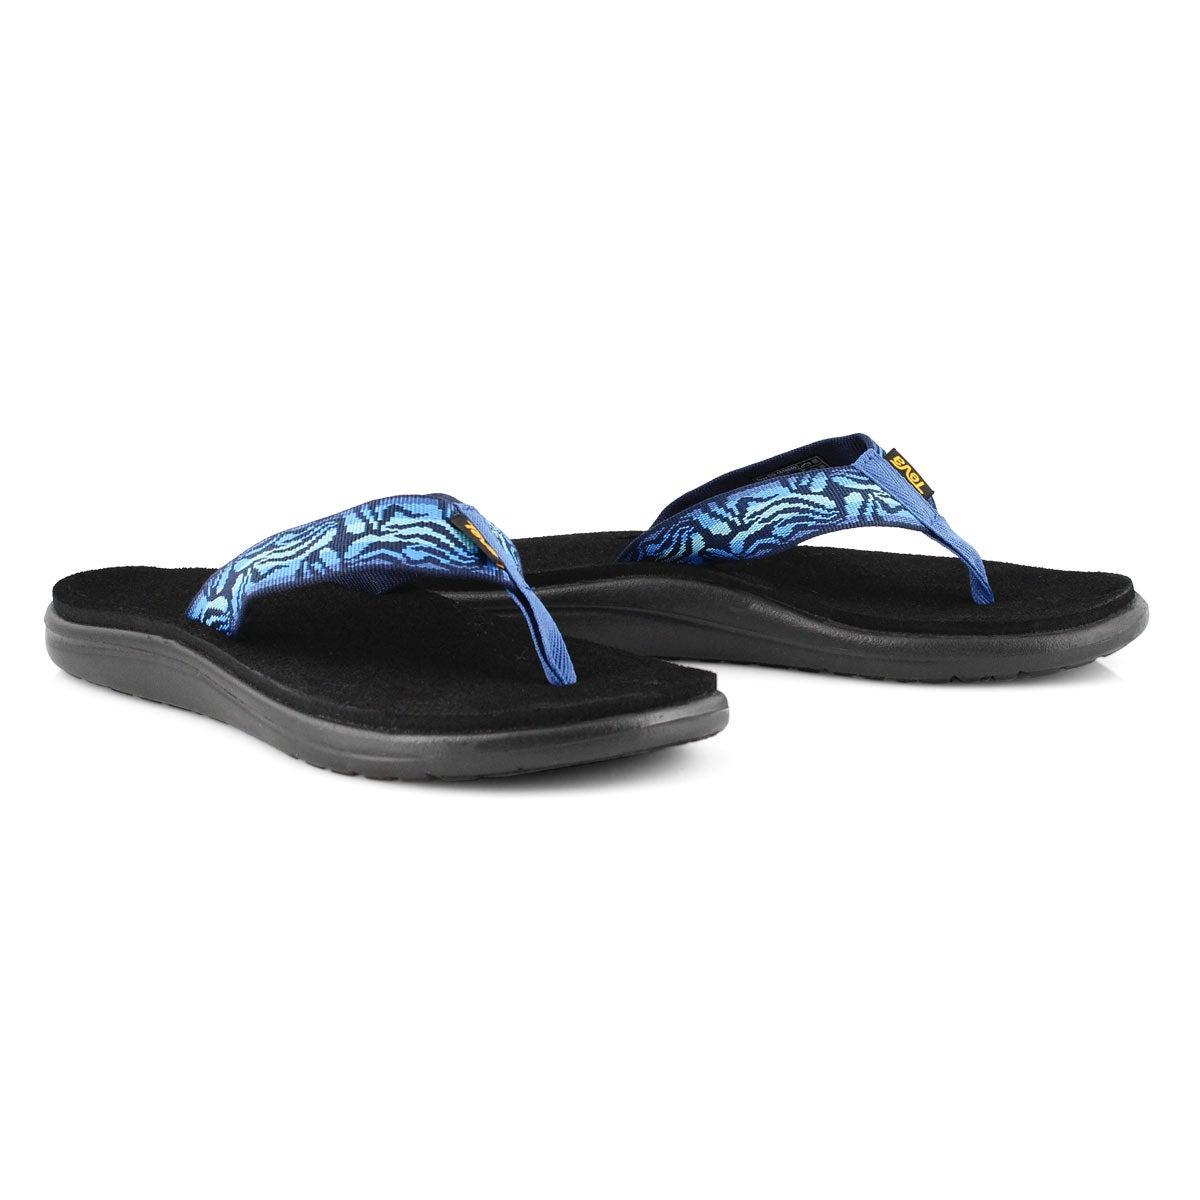 Women's VOYA FLIP minoa black iris casual sandals